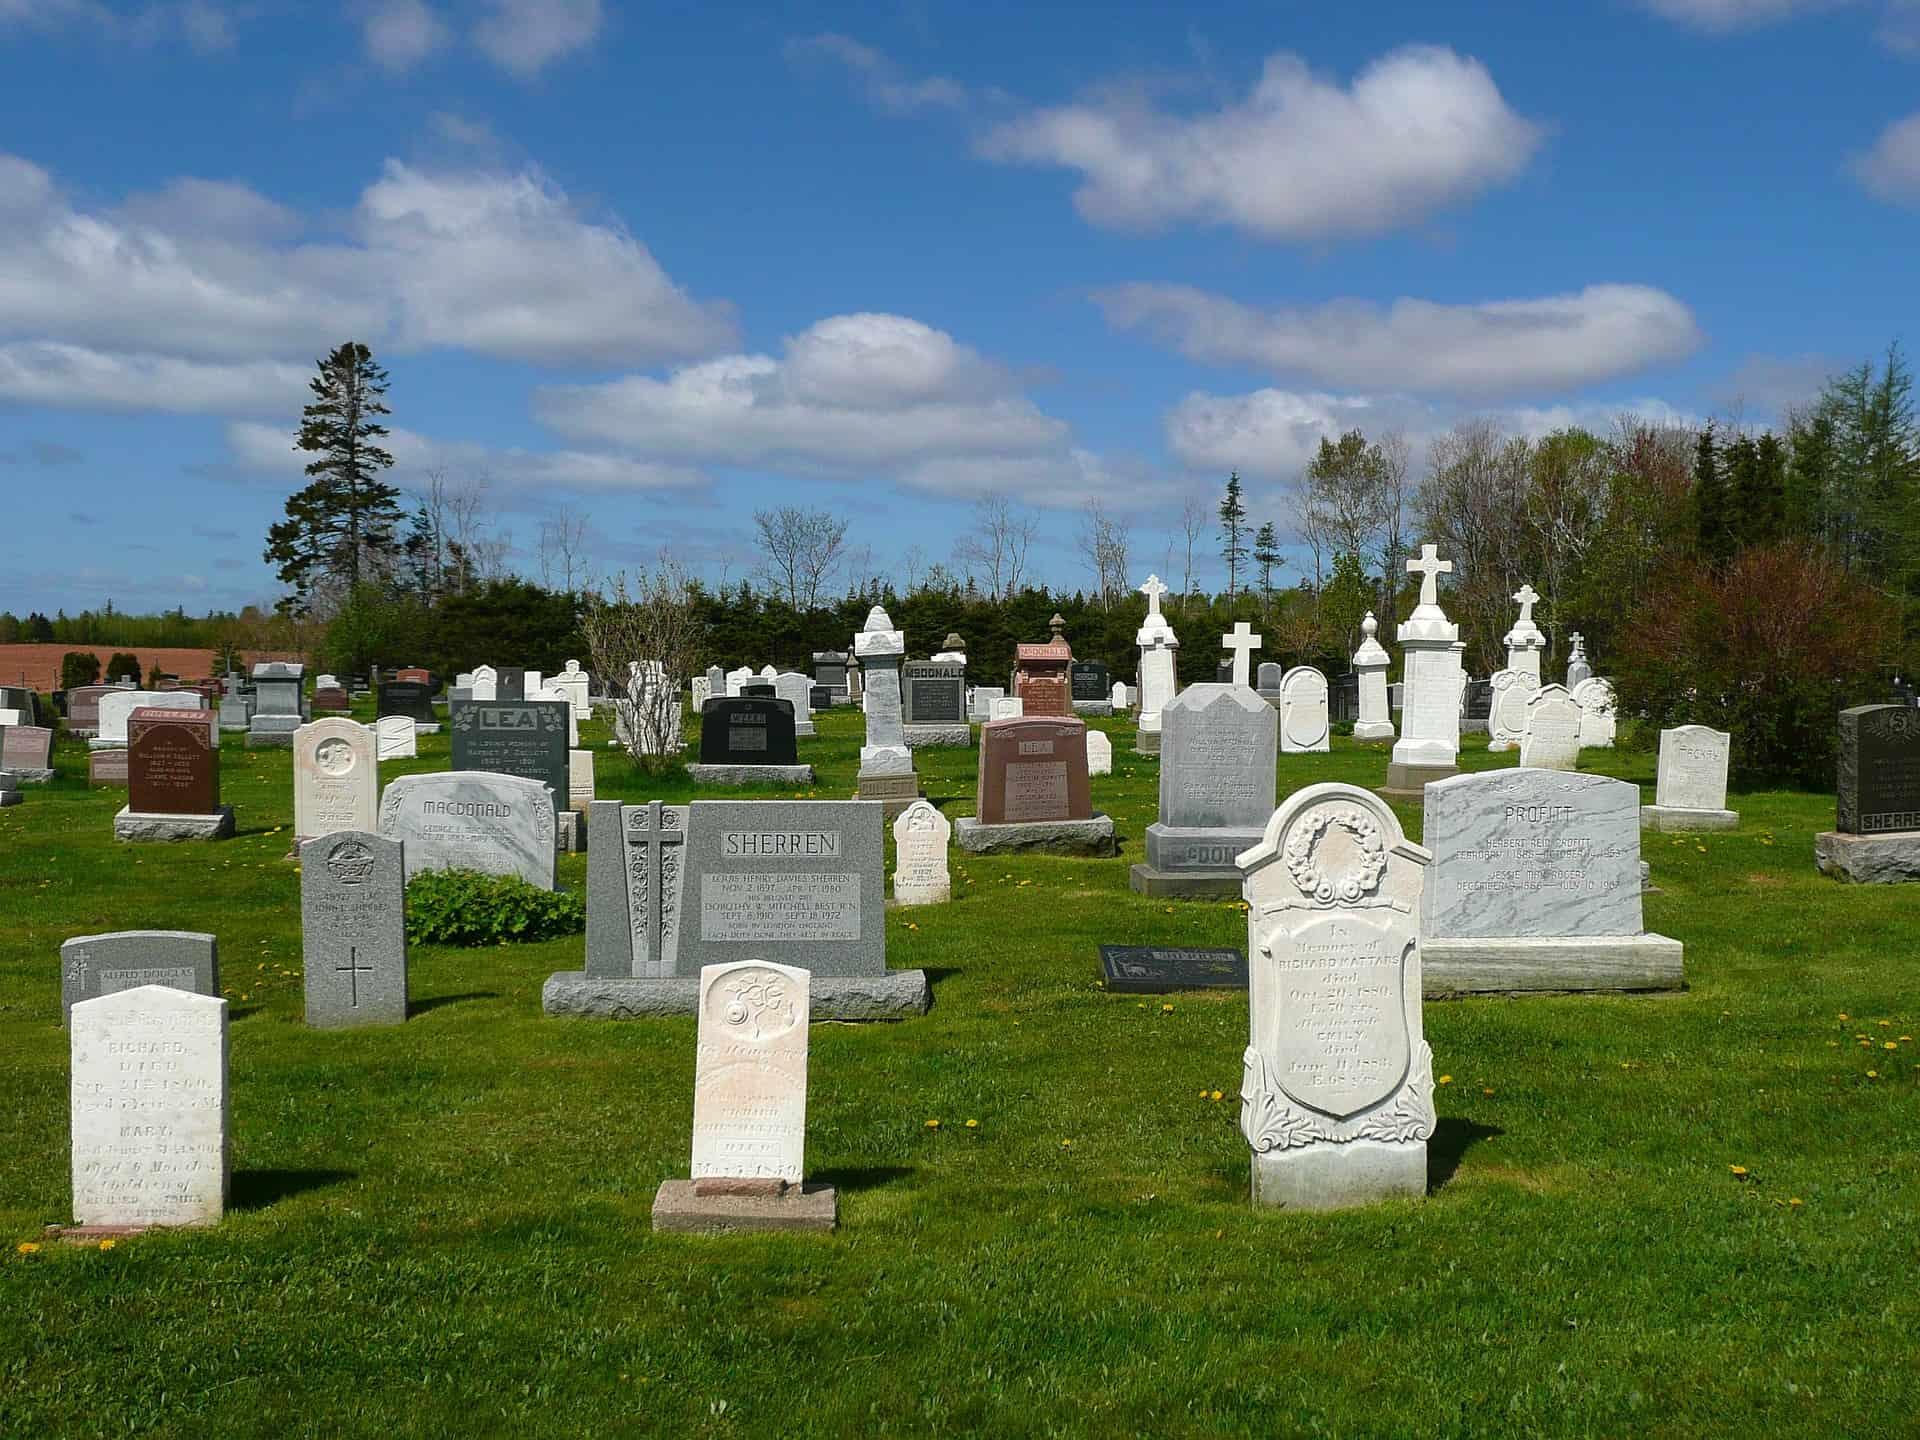 graves-54965_1920